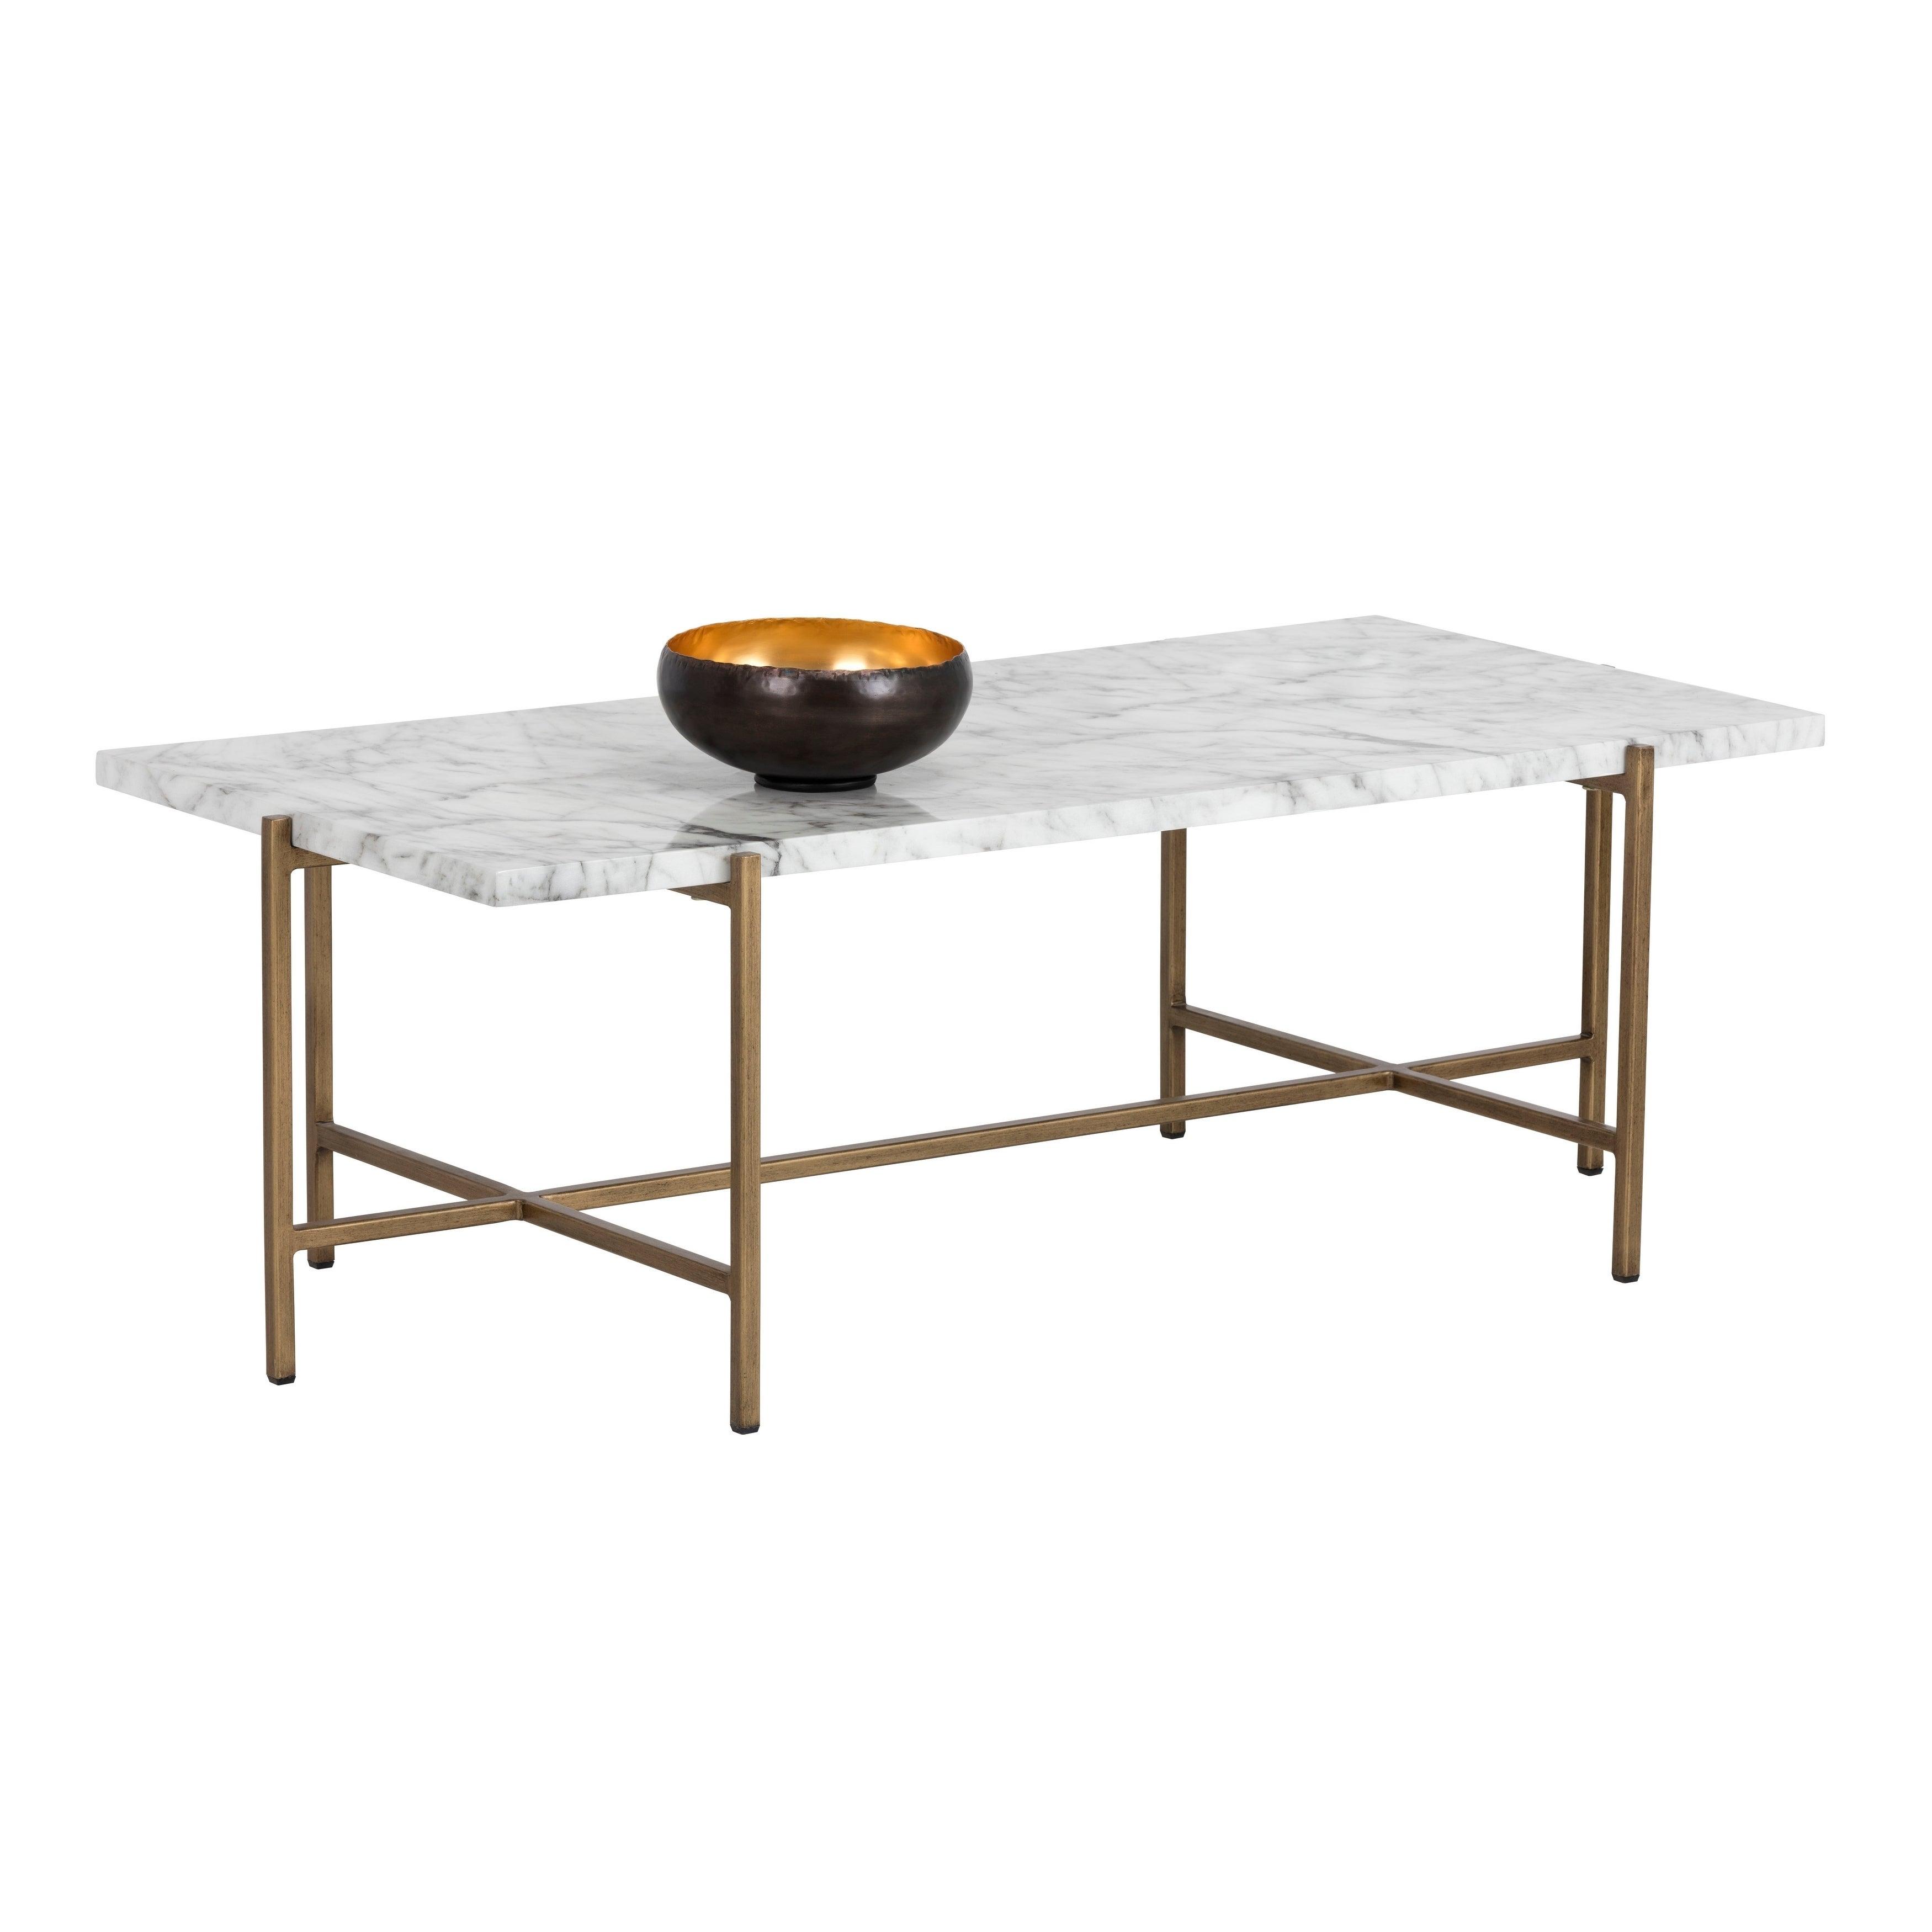 Shop Sunpan Mixt 102936 Solana Coffee Table Rectangular Marble Look Overstock 28655131